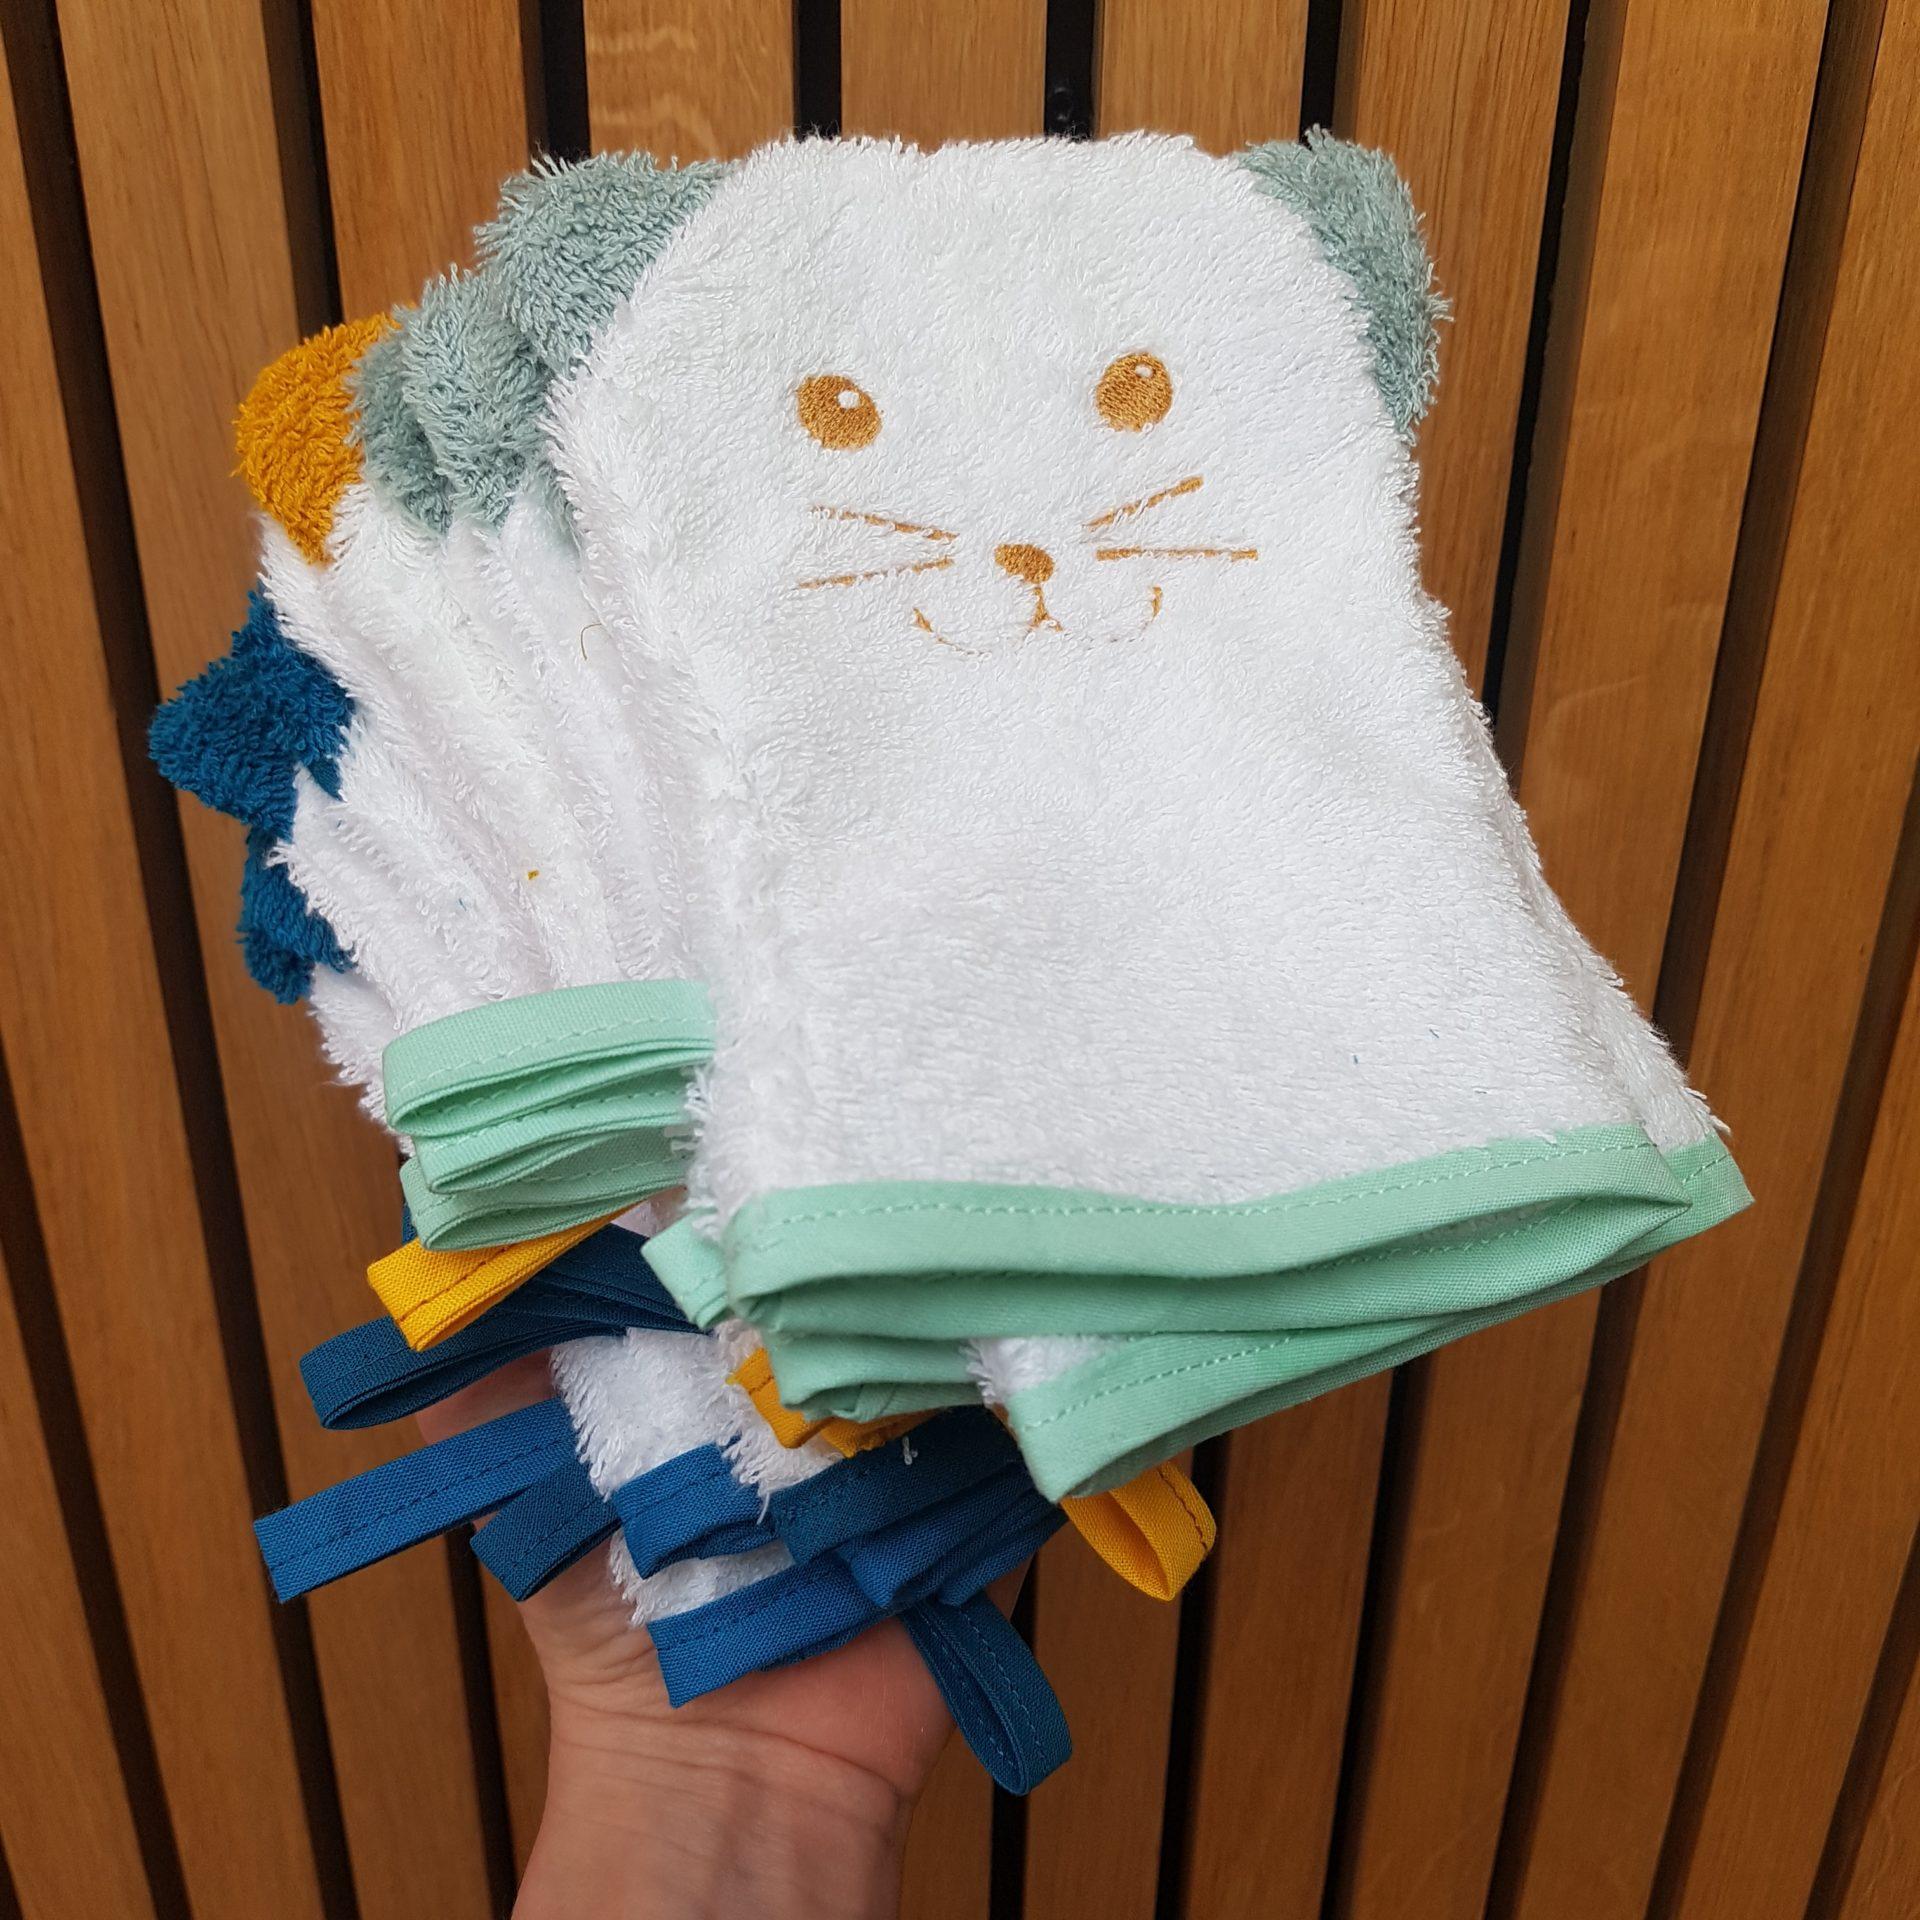 de joli gant de toilette a adopter